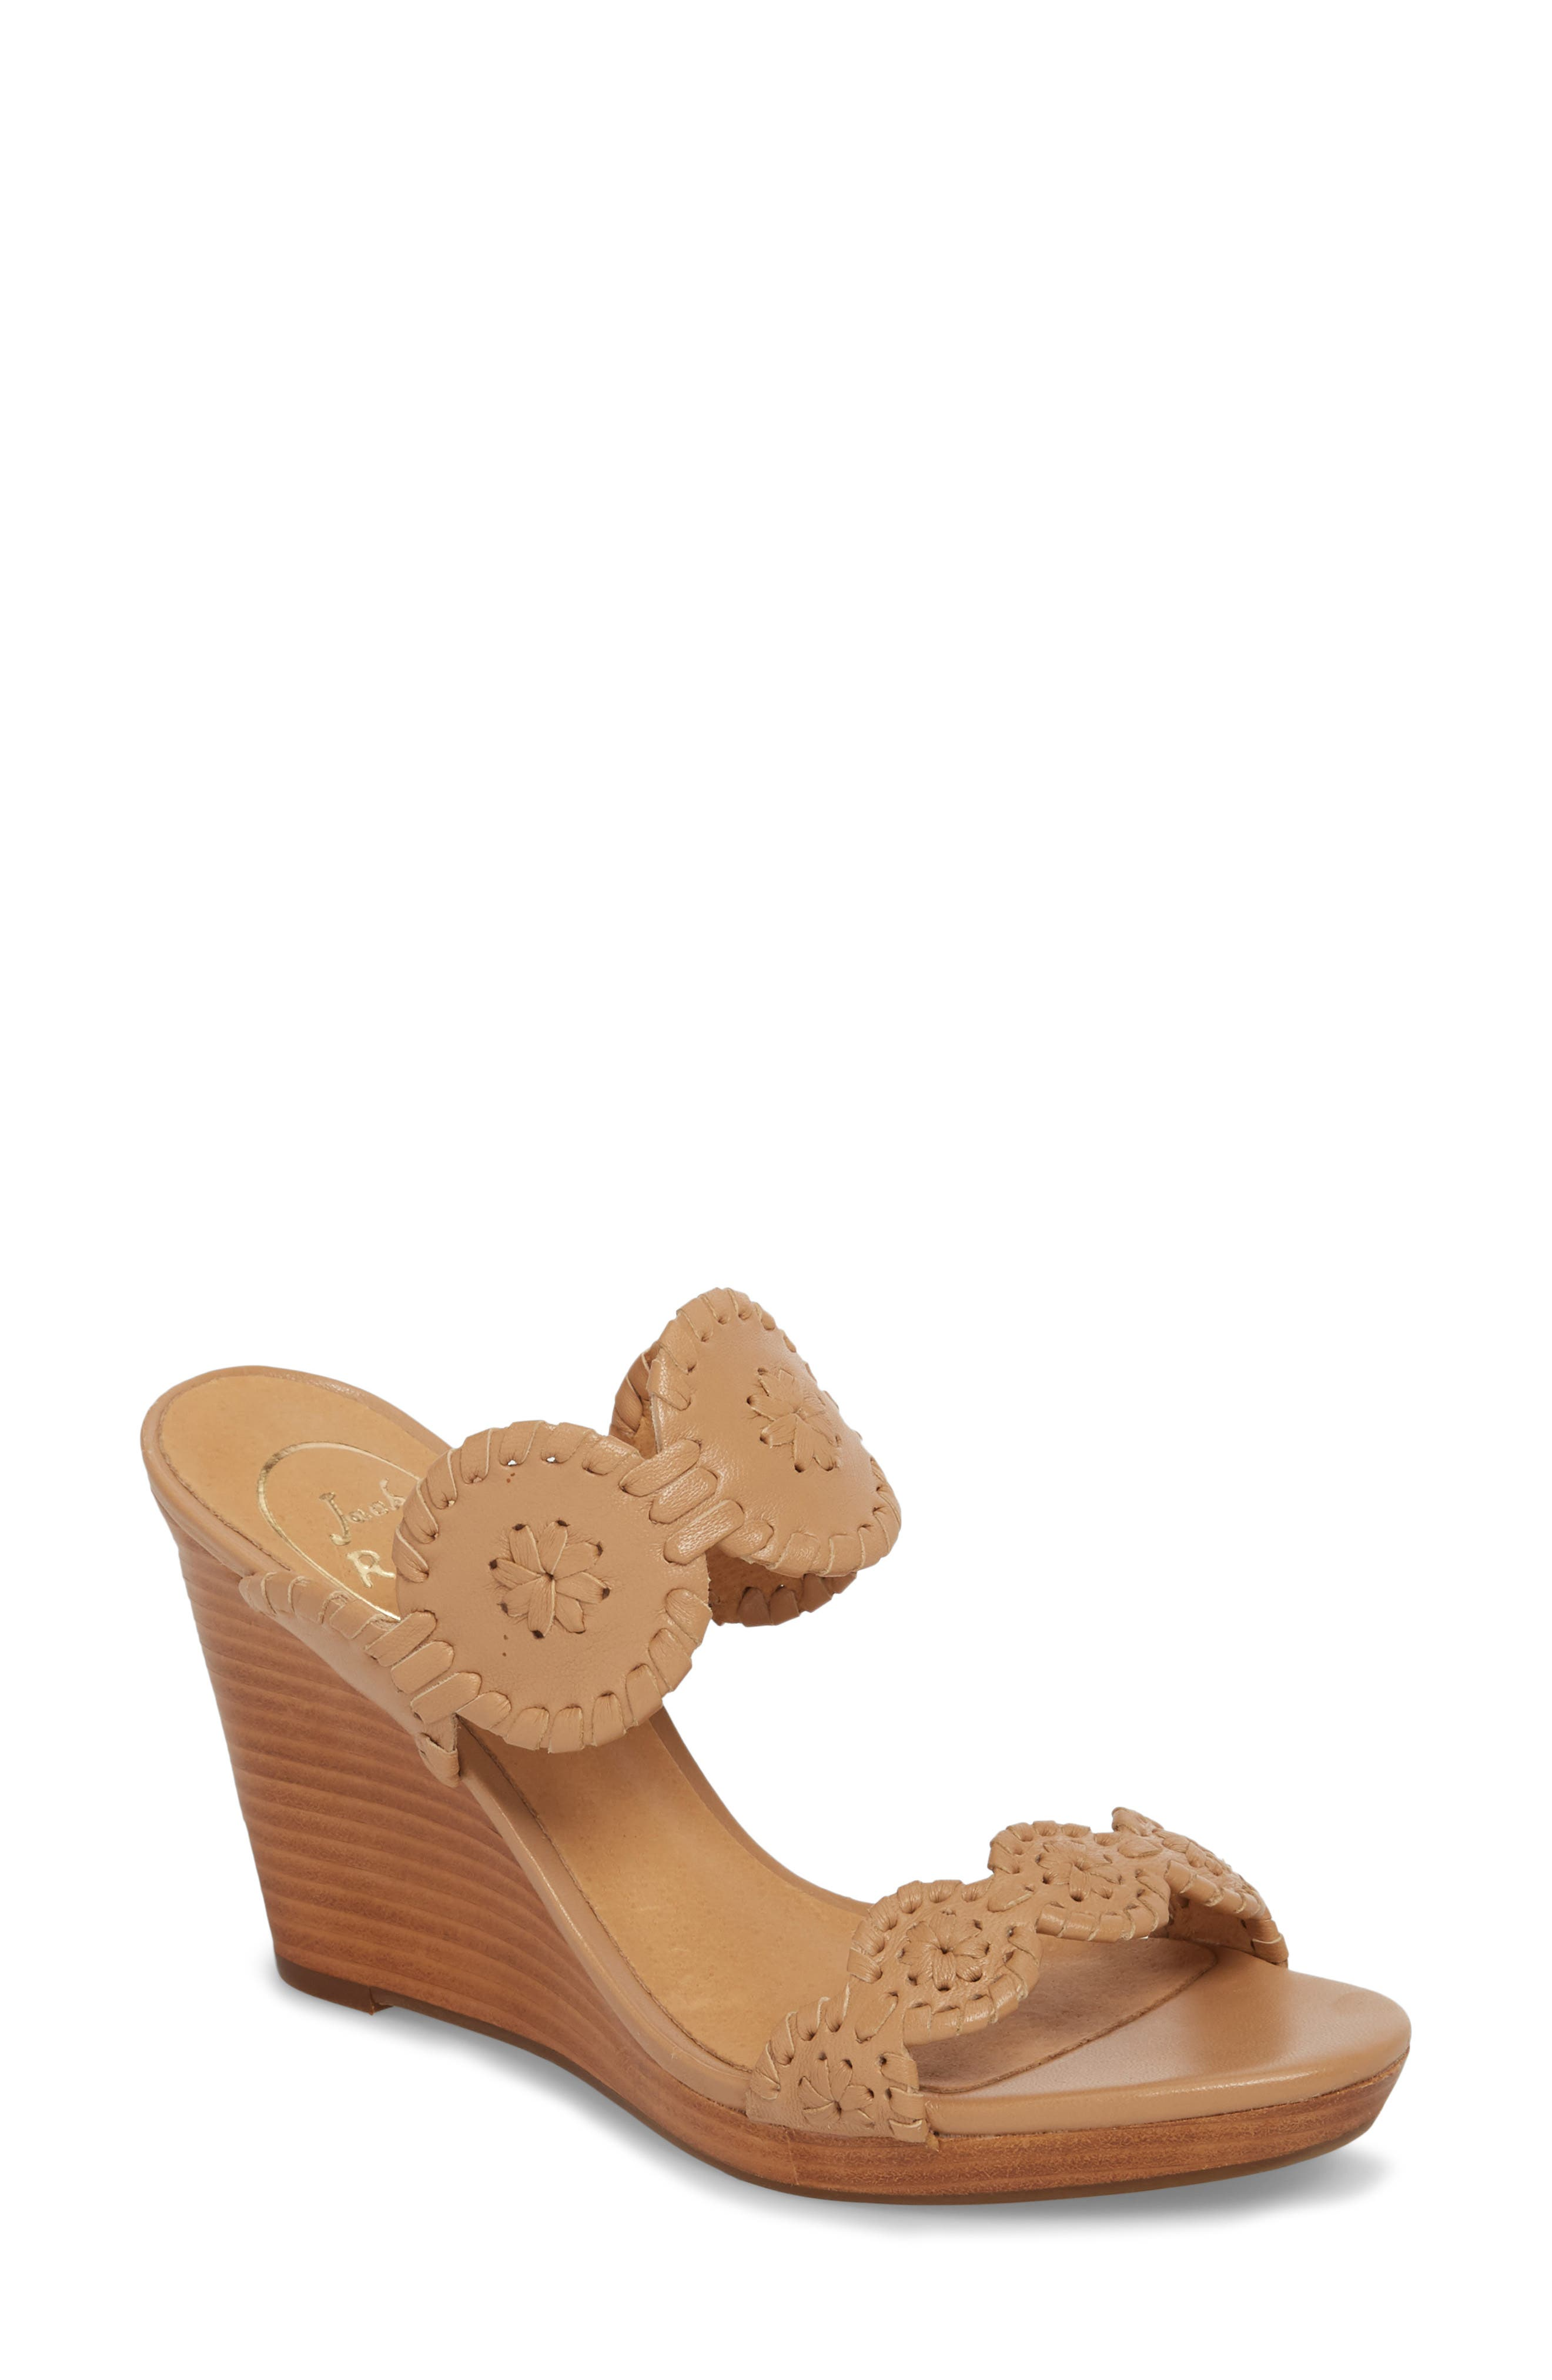 'Luccia' Sandal,                         Main,                         color, 250